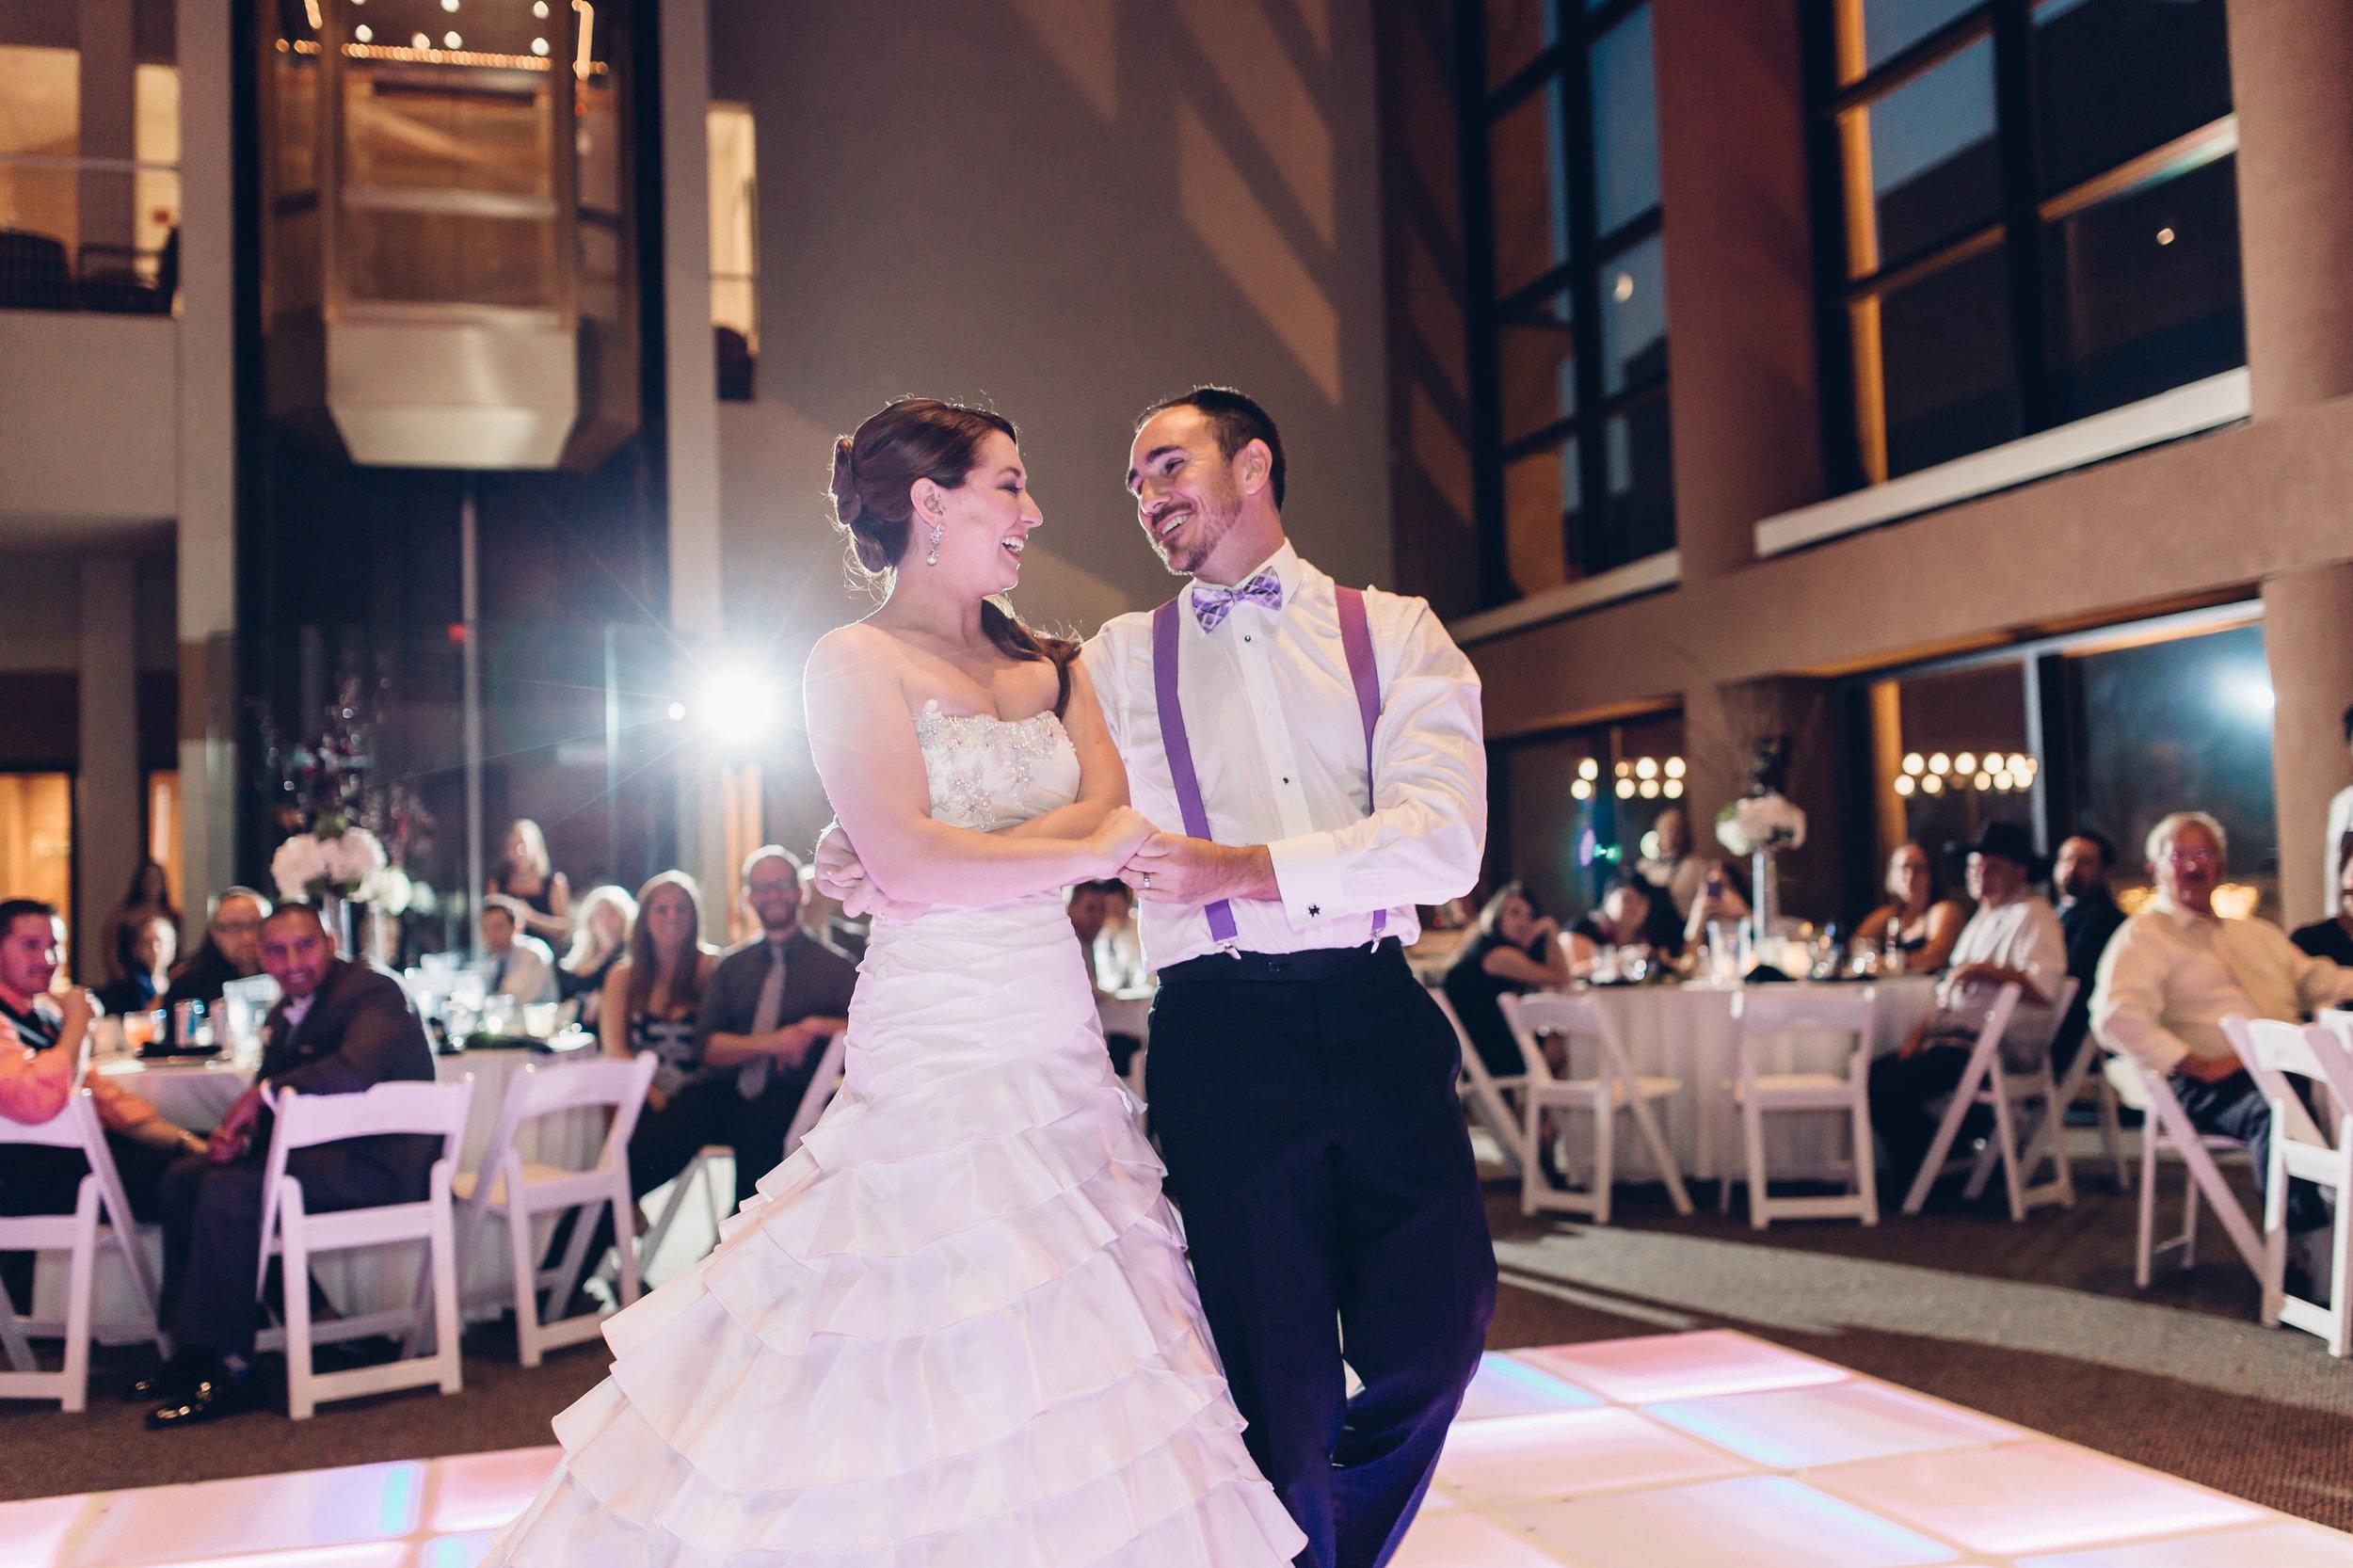 Bride-and-groom-first-dance-valentine-theatre